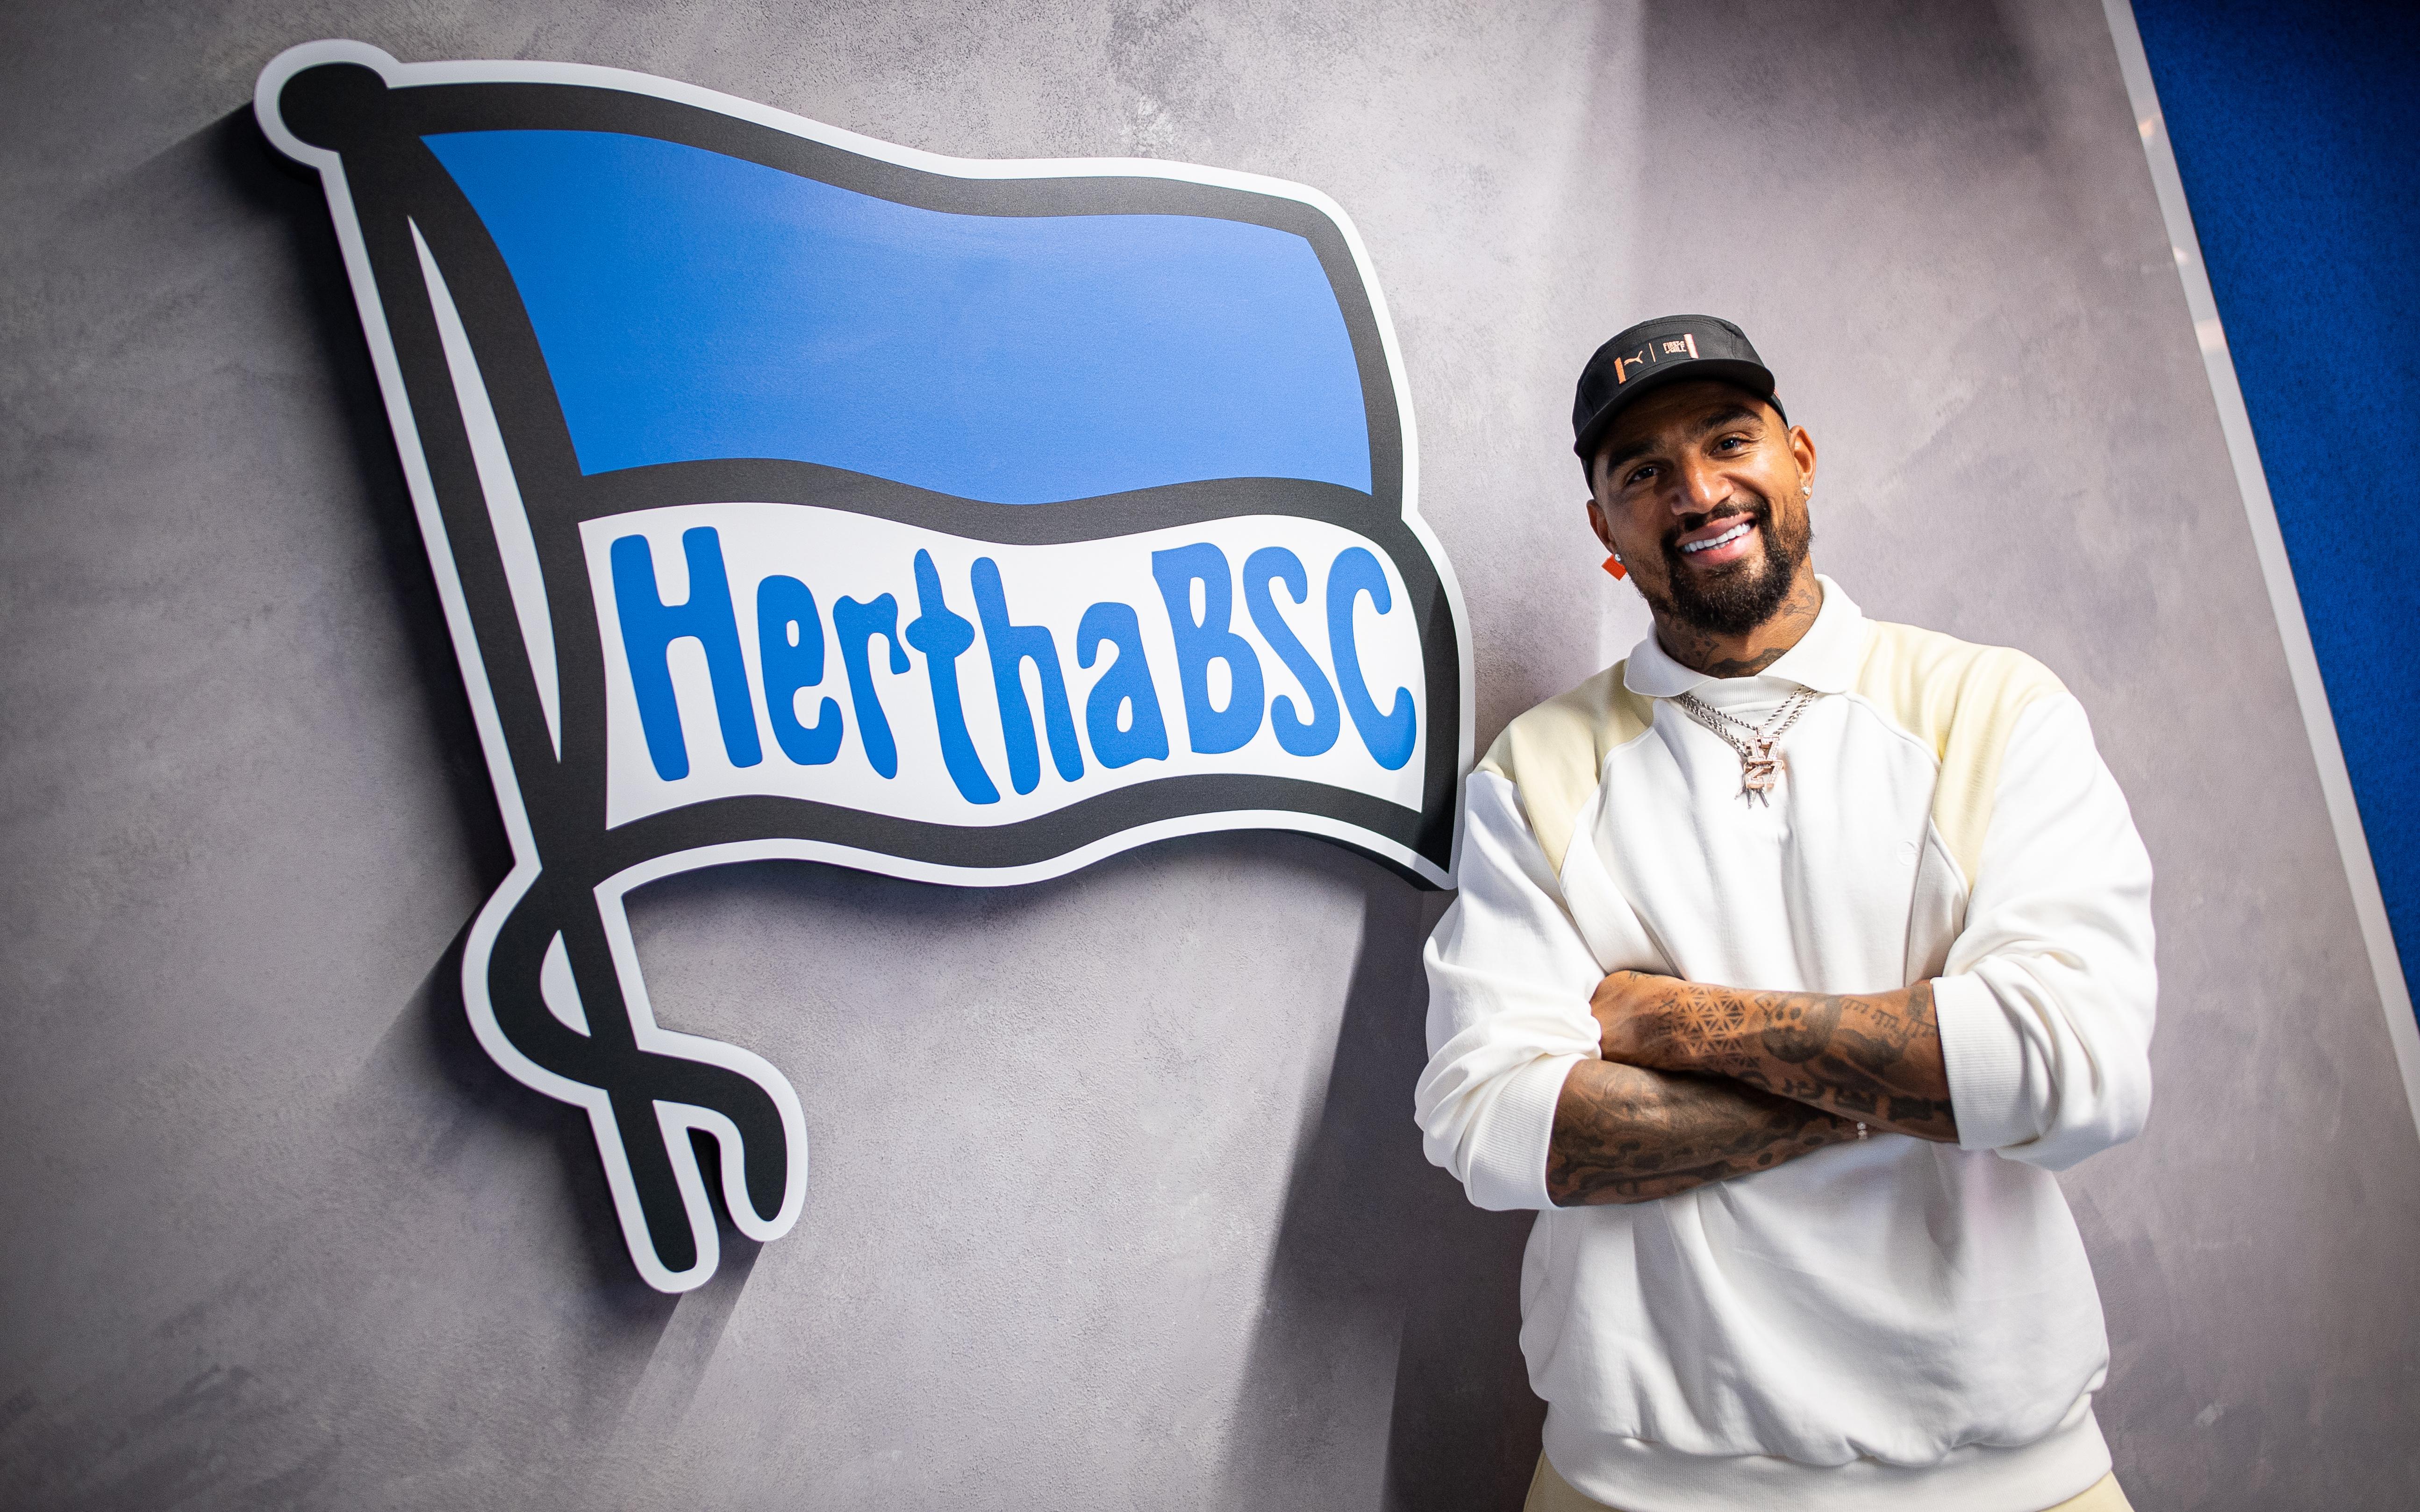 Kevin-Prince Boateng en la oficina del Hertha BSC.